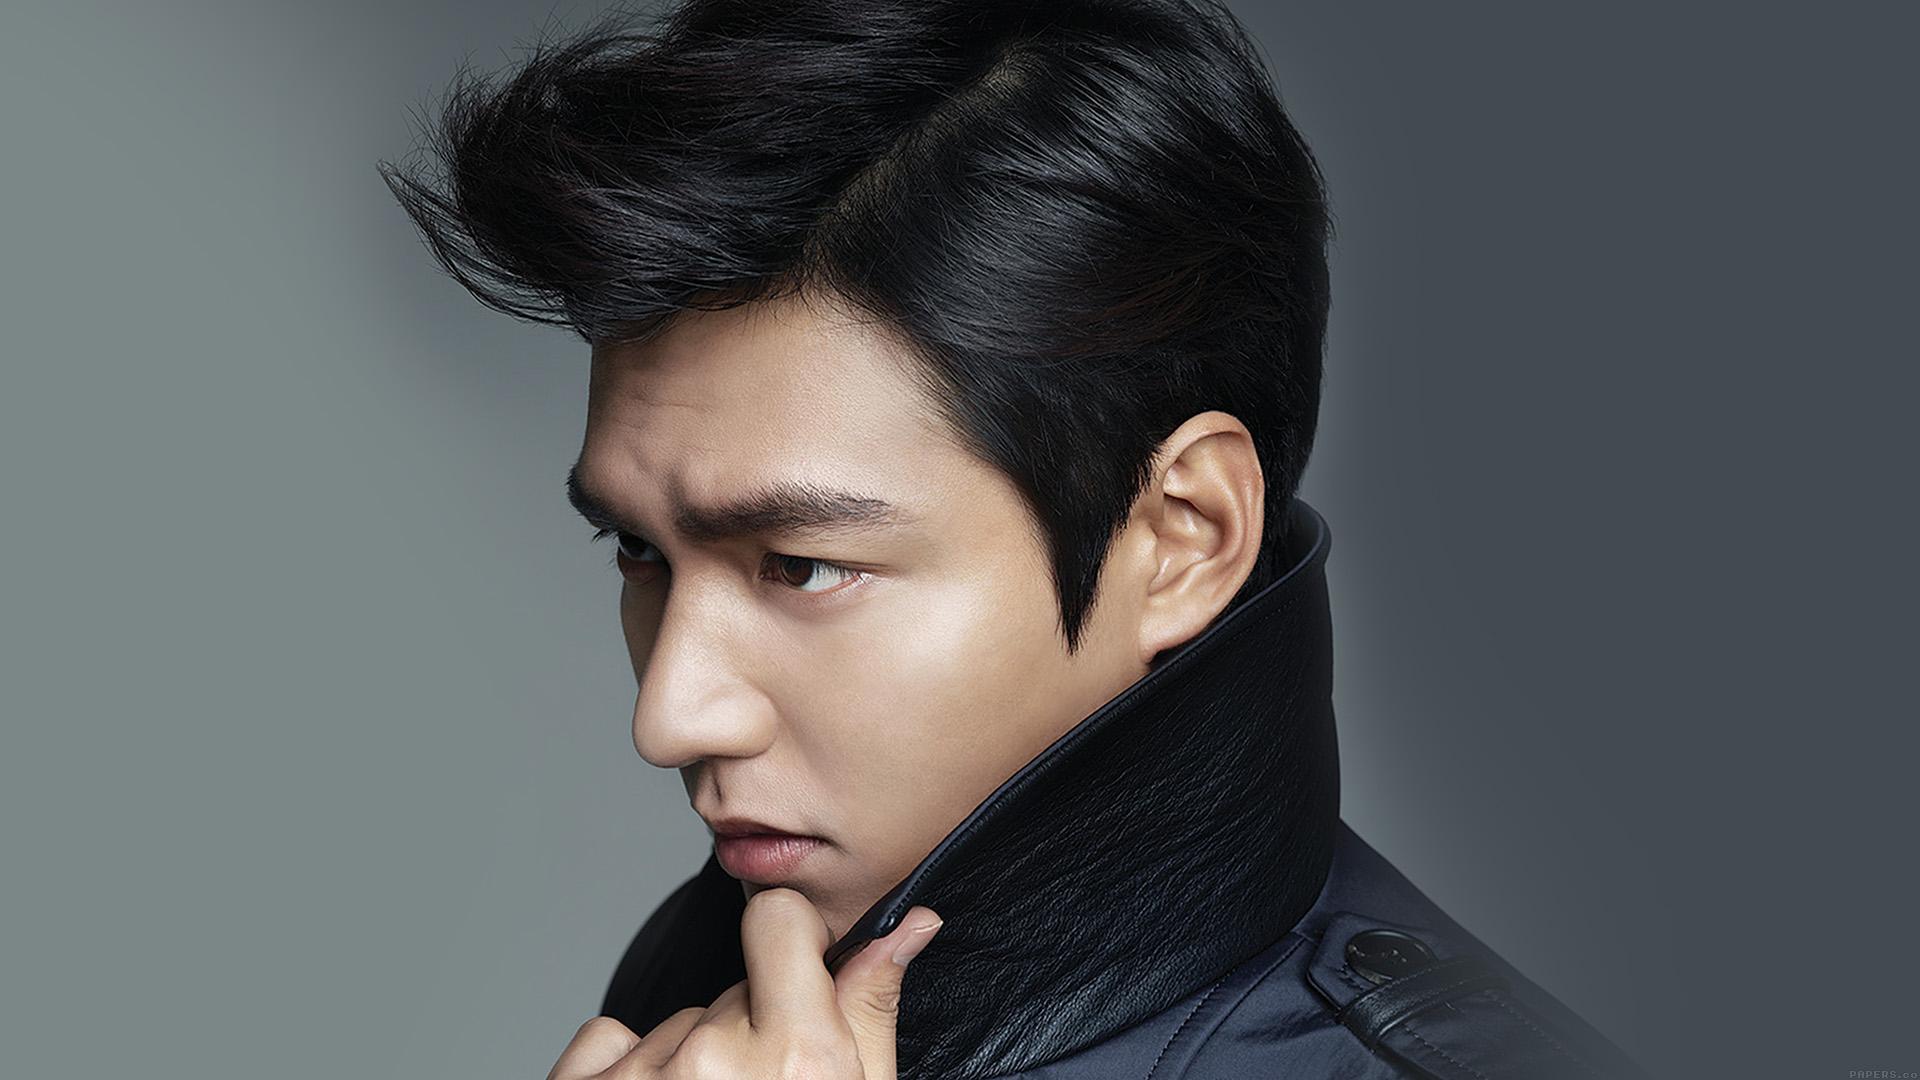 He44 Leeminho Kpop Star Film Sexy Papers Co